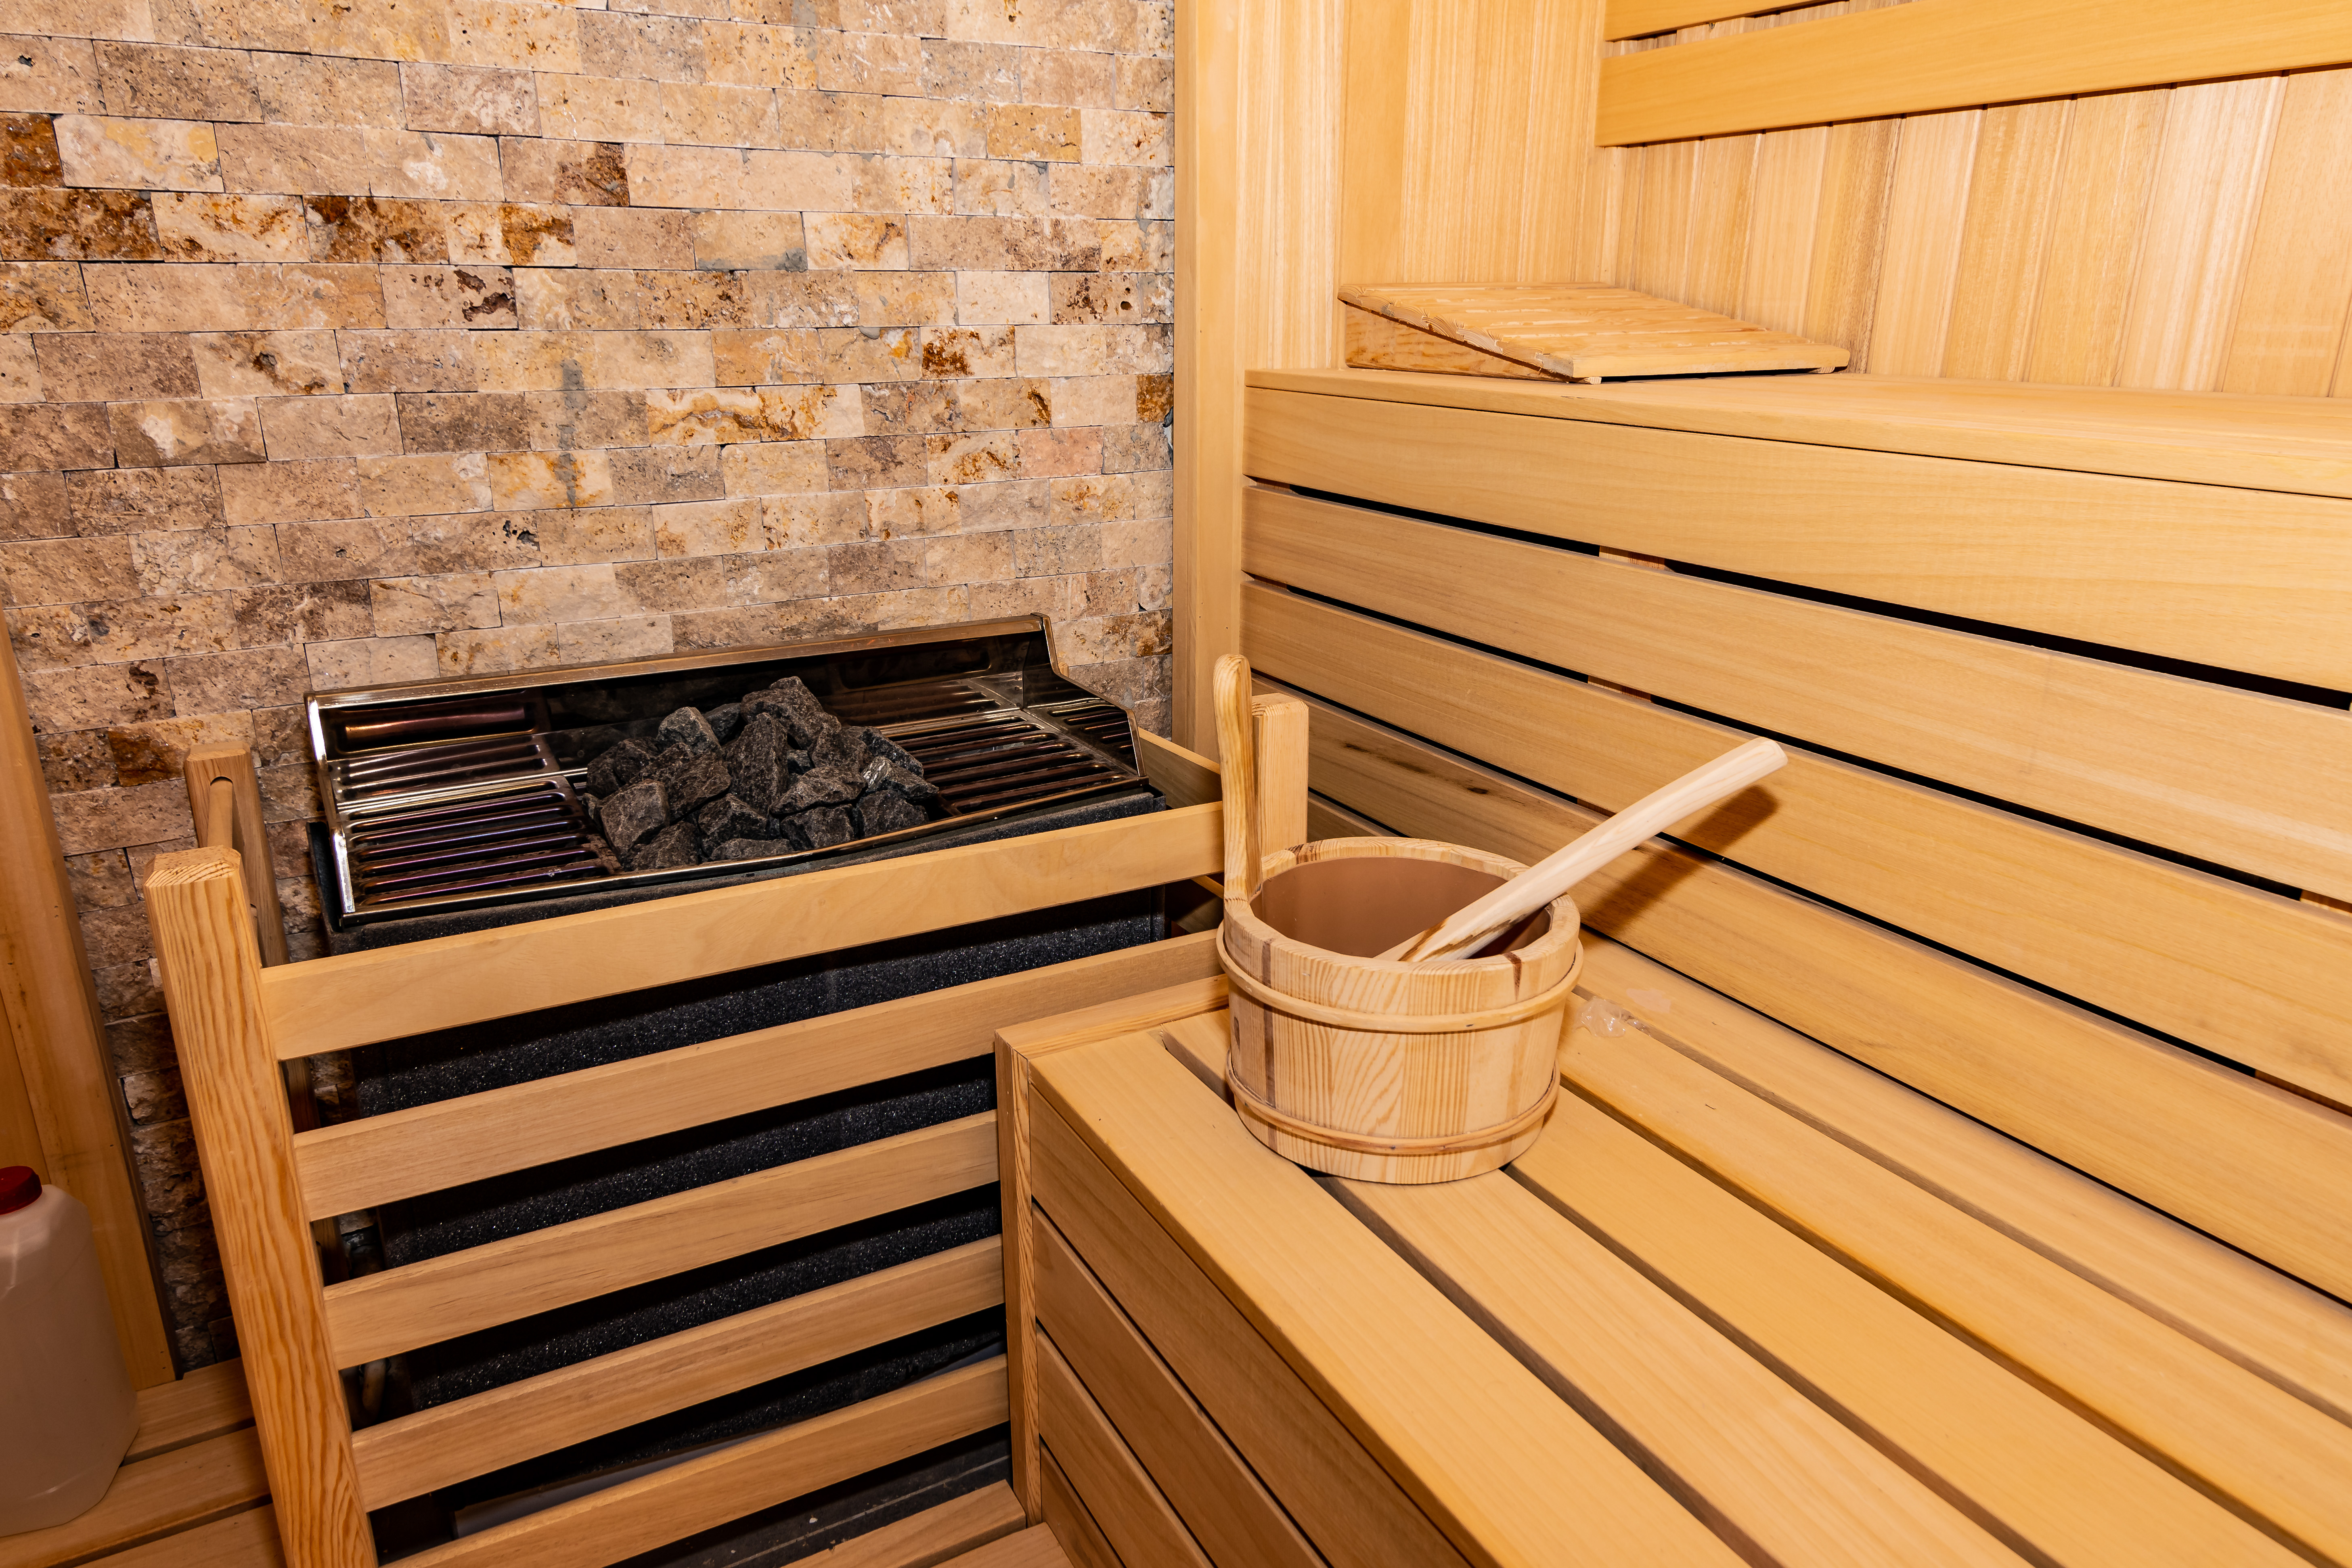 Apartment Joya Cyprus Starlight Garden Apartment photo 20381278